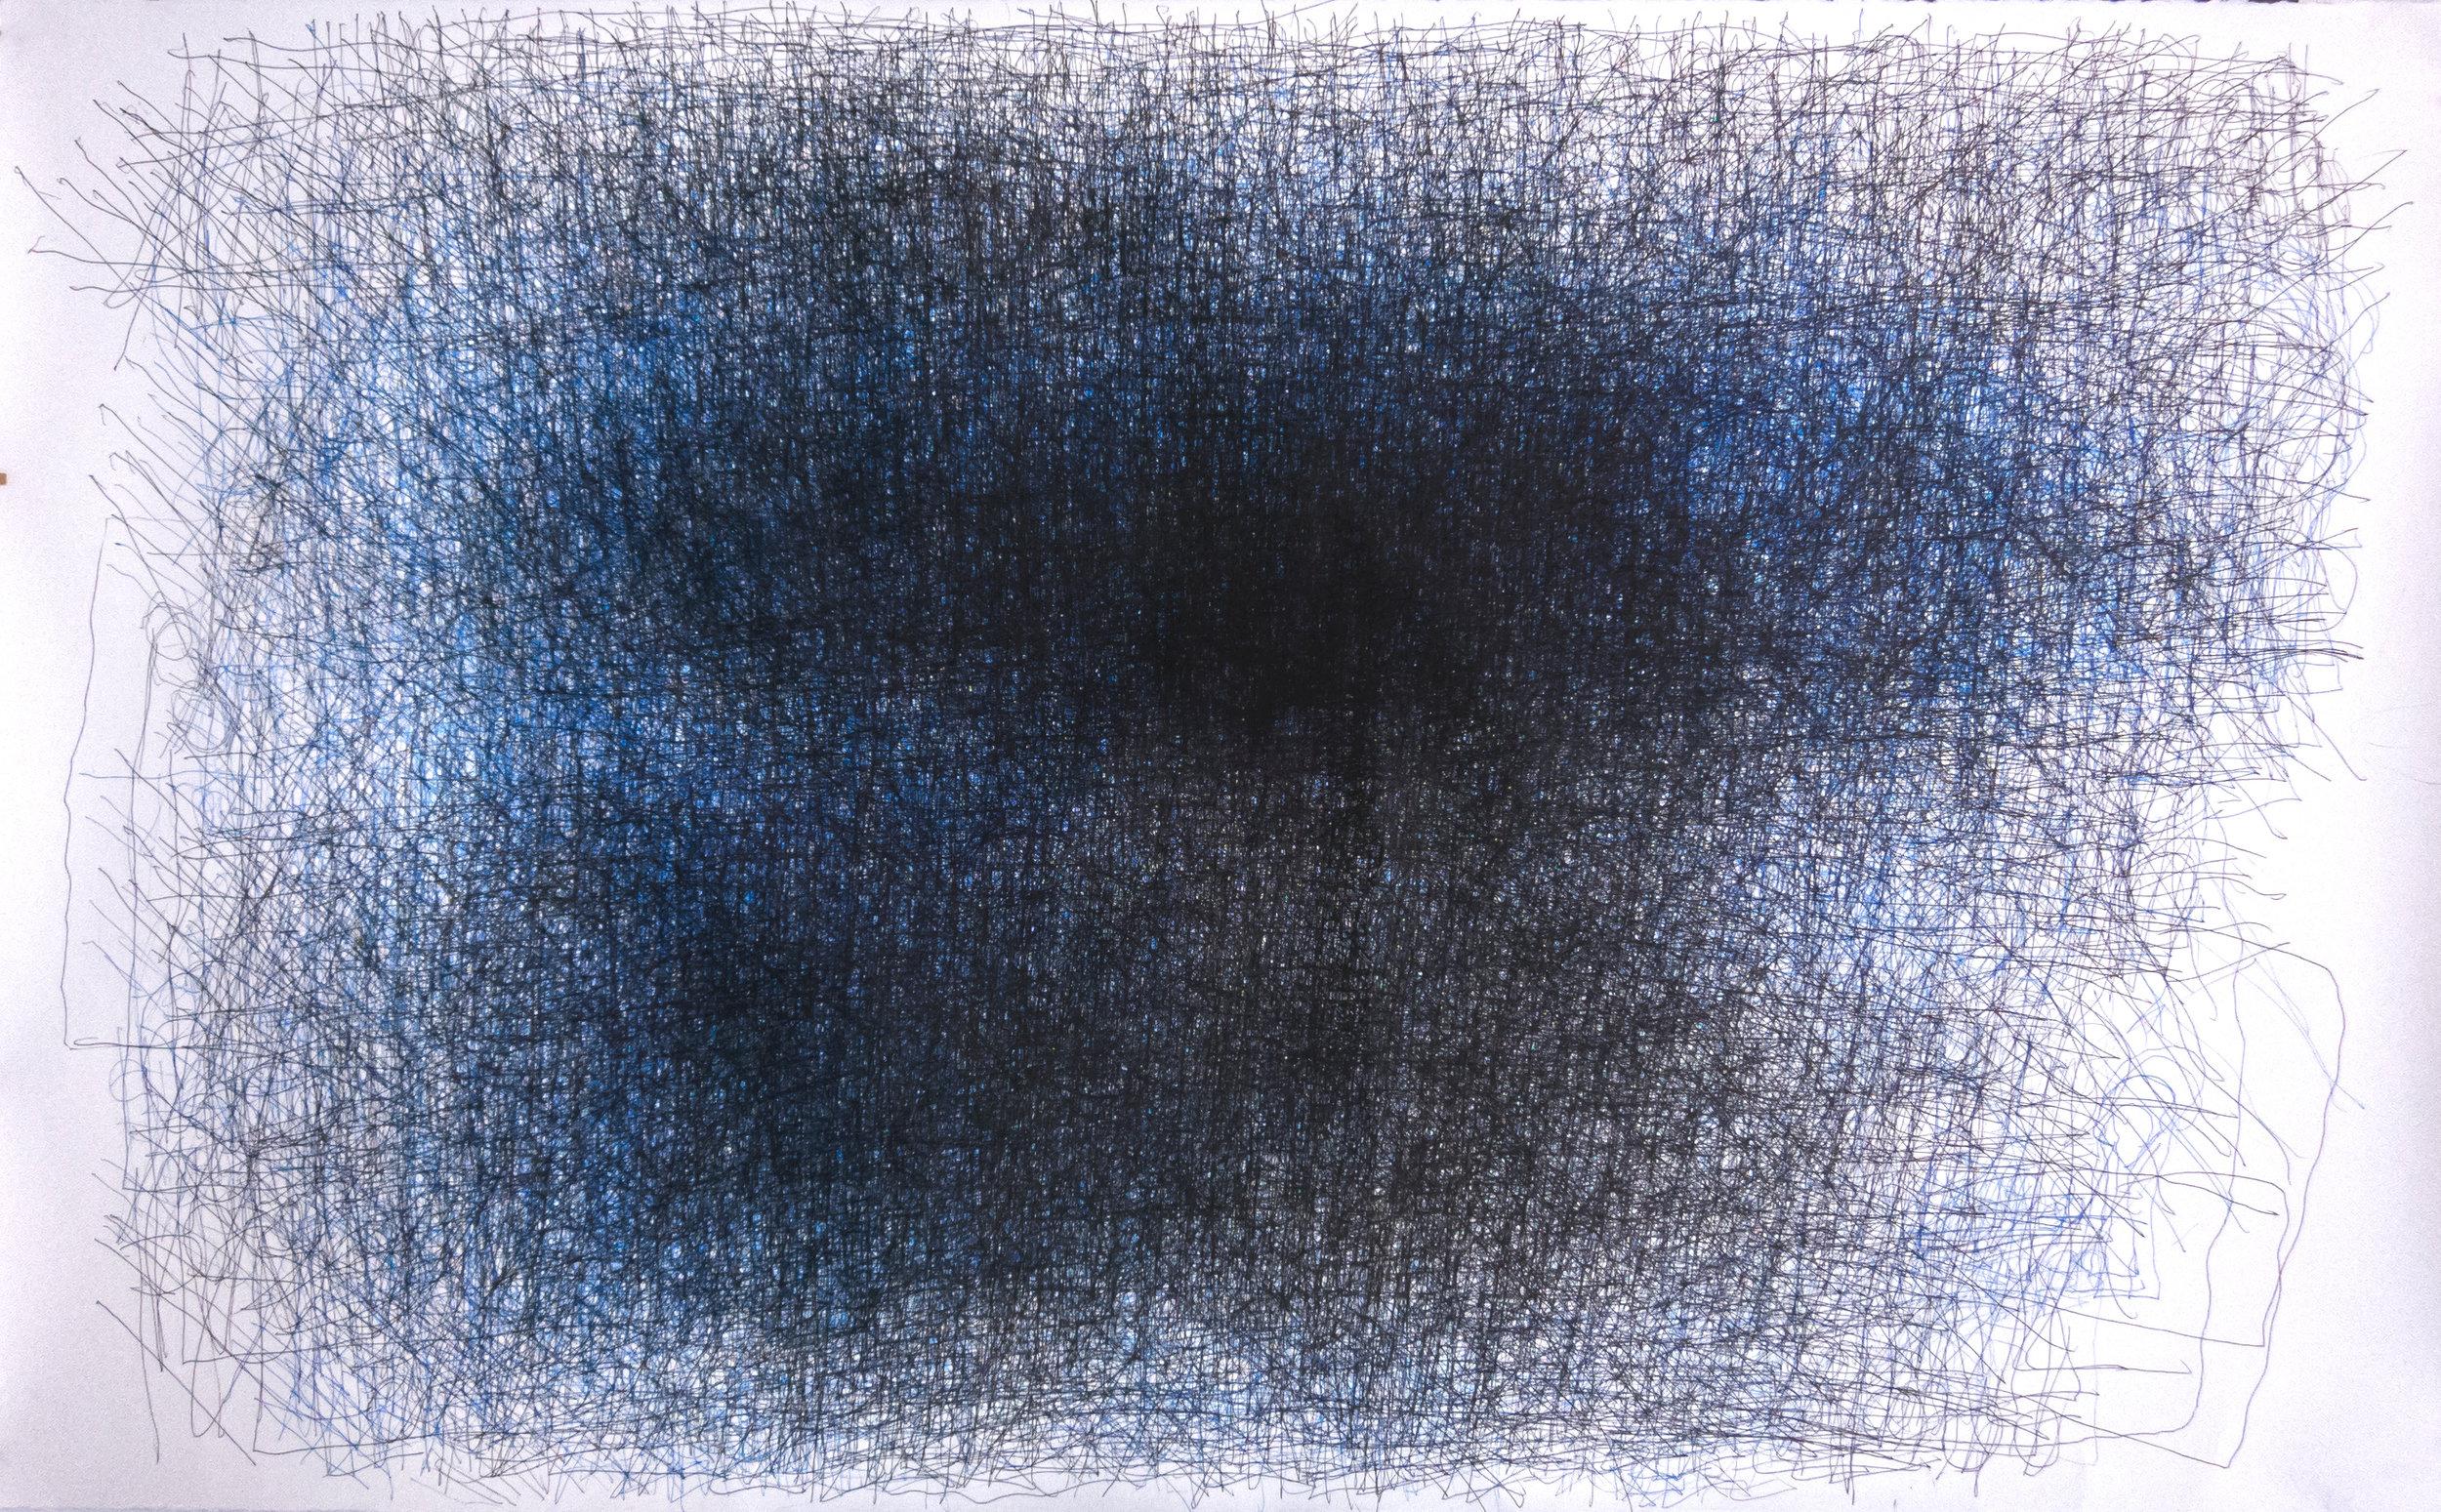 Dan Miller, Untitled (DM 257), 2016, 52 x 85 inches